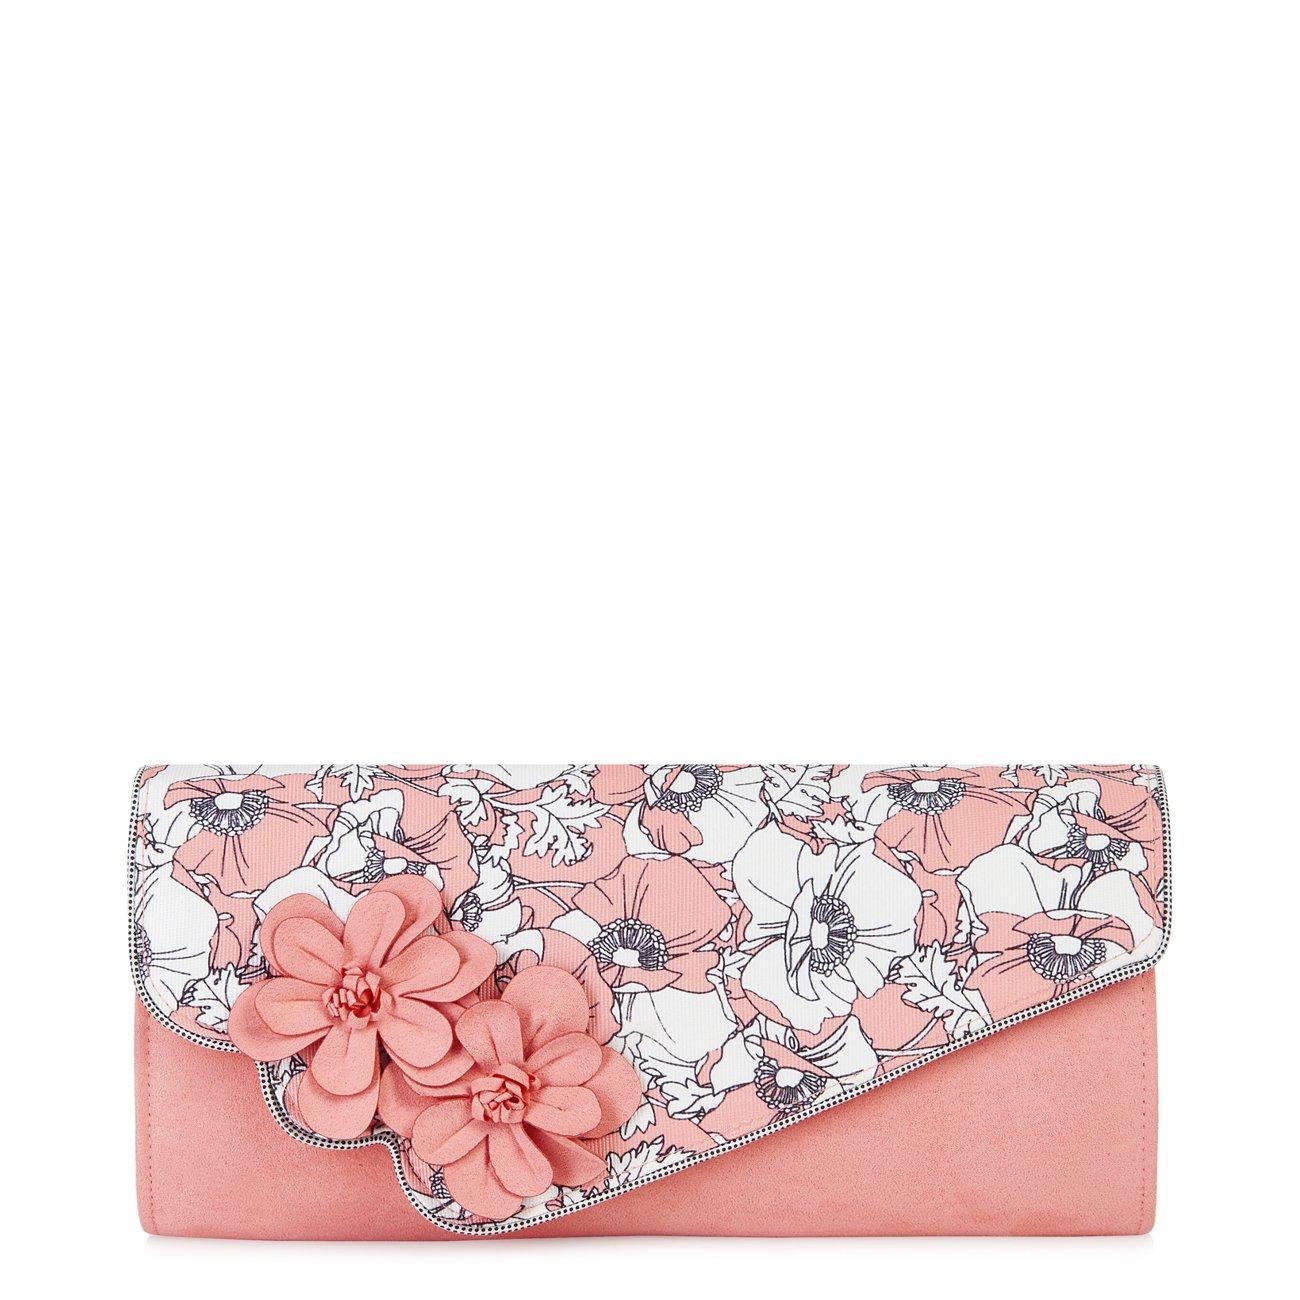 Ruby Shoo Women's Peach Floral Heidi Fabric Slingback Pumps & Rio Bag UK 5 EU 38 by Ruby Shoo (Image #6)